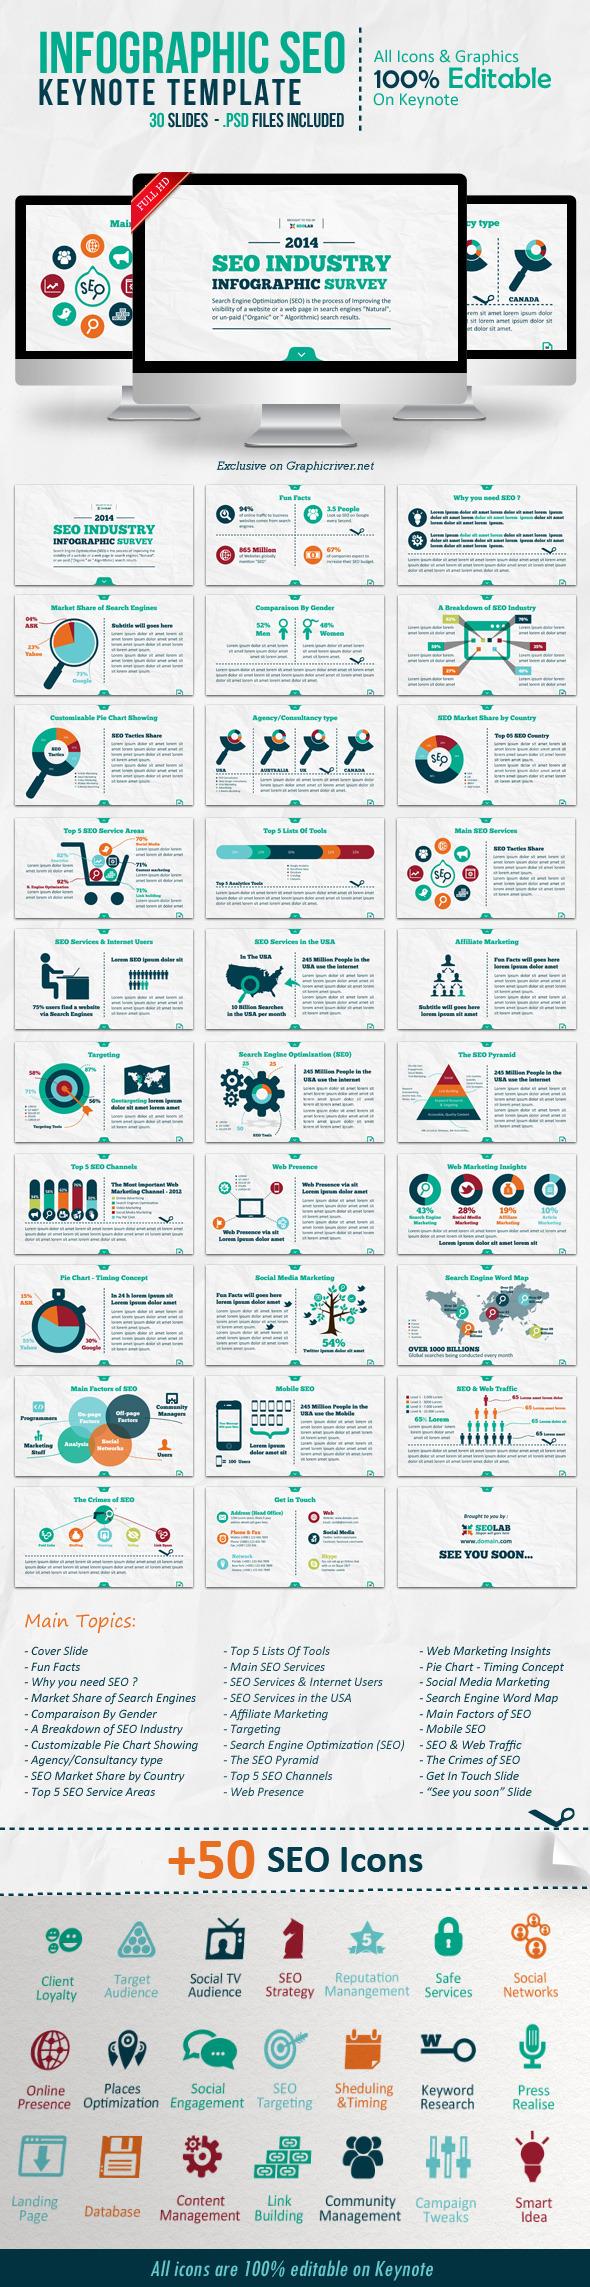 Infographic SEO Keynote Template - Creative Keynote Templates